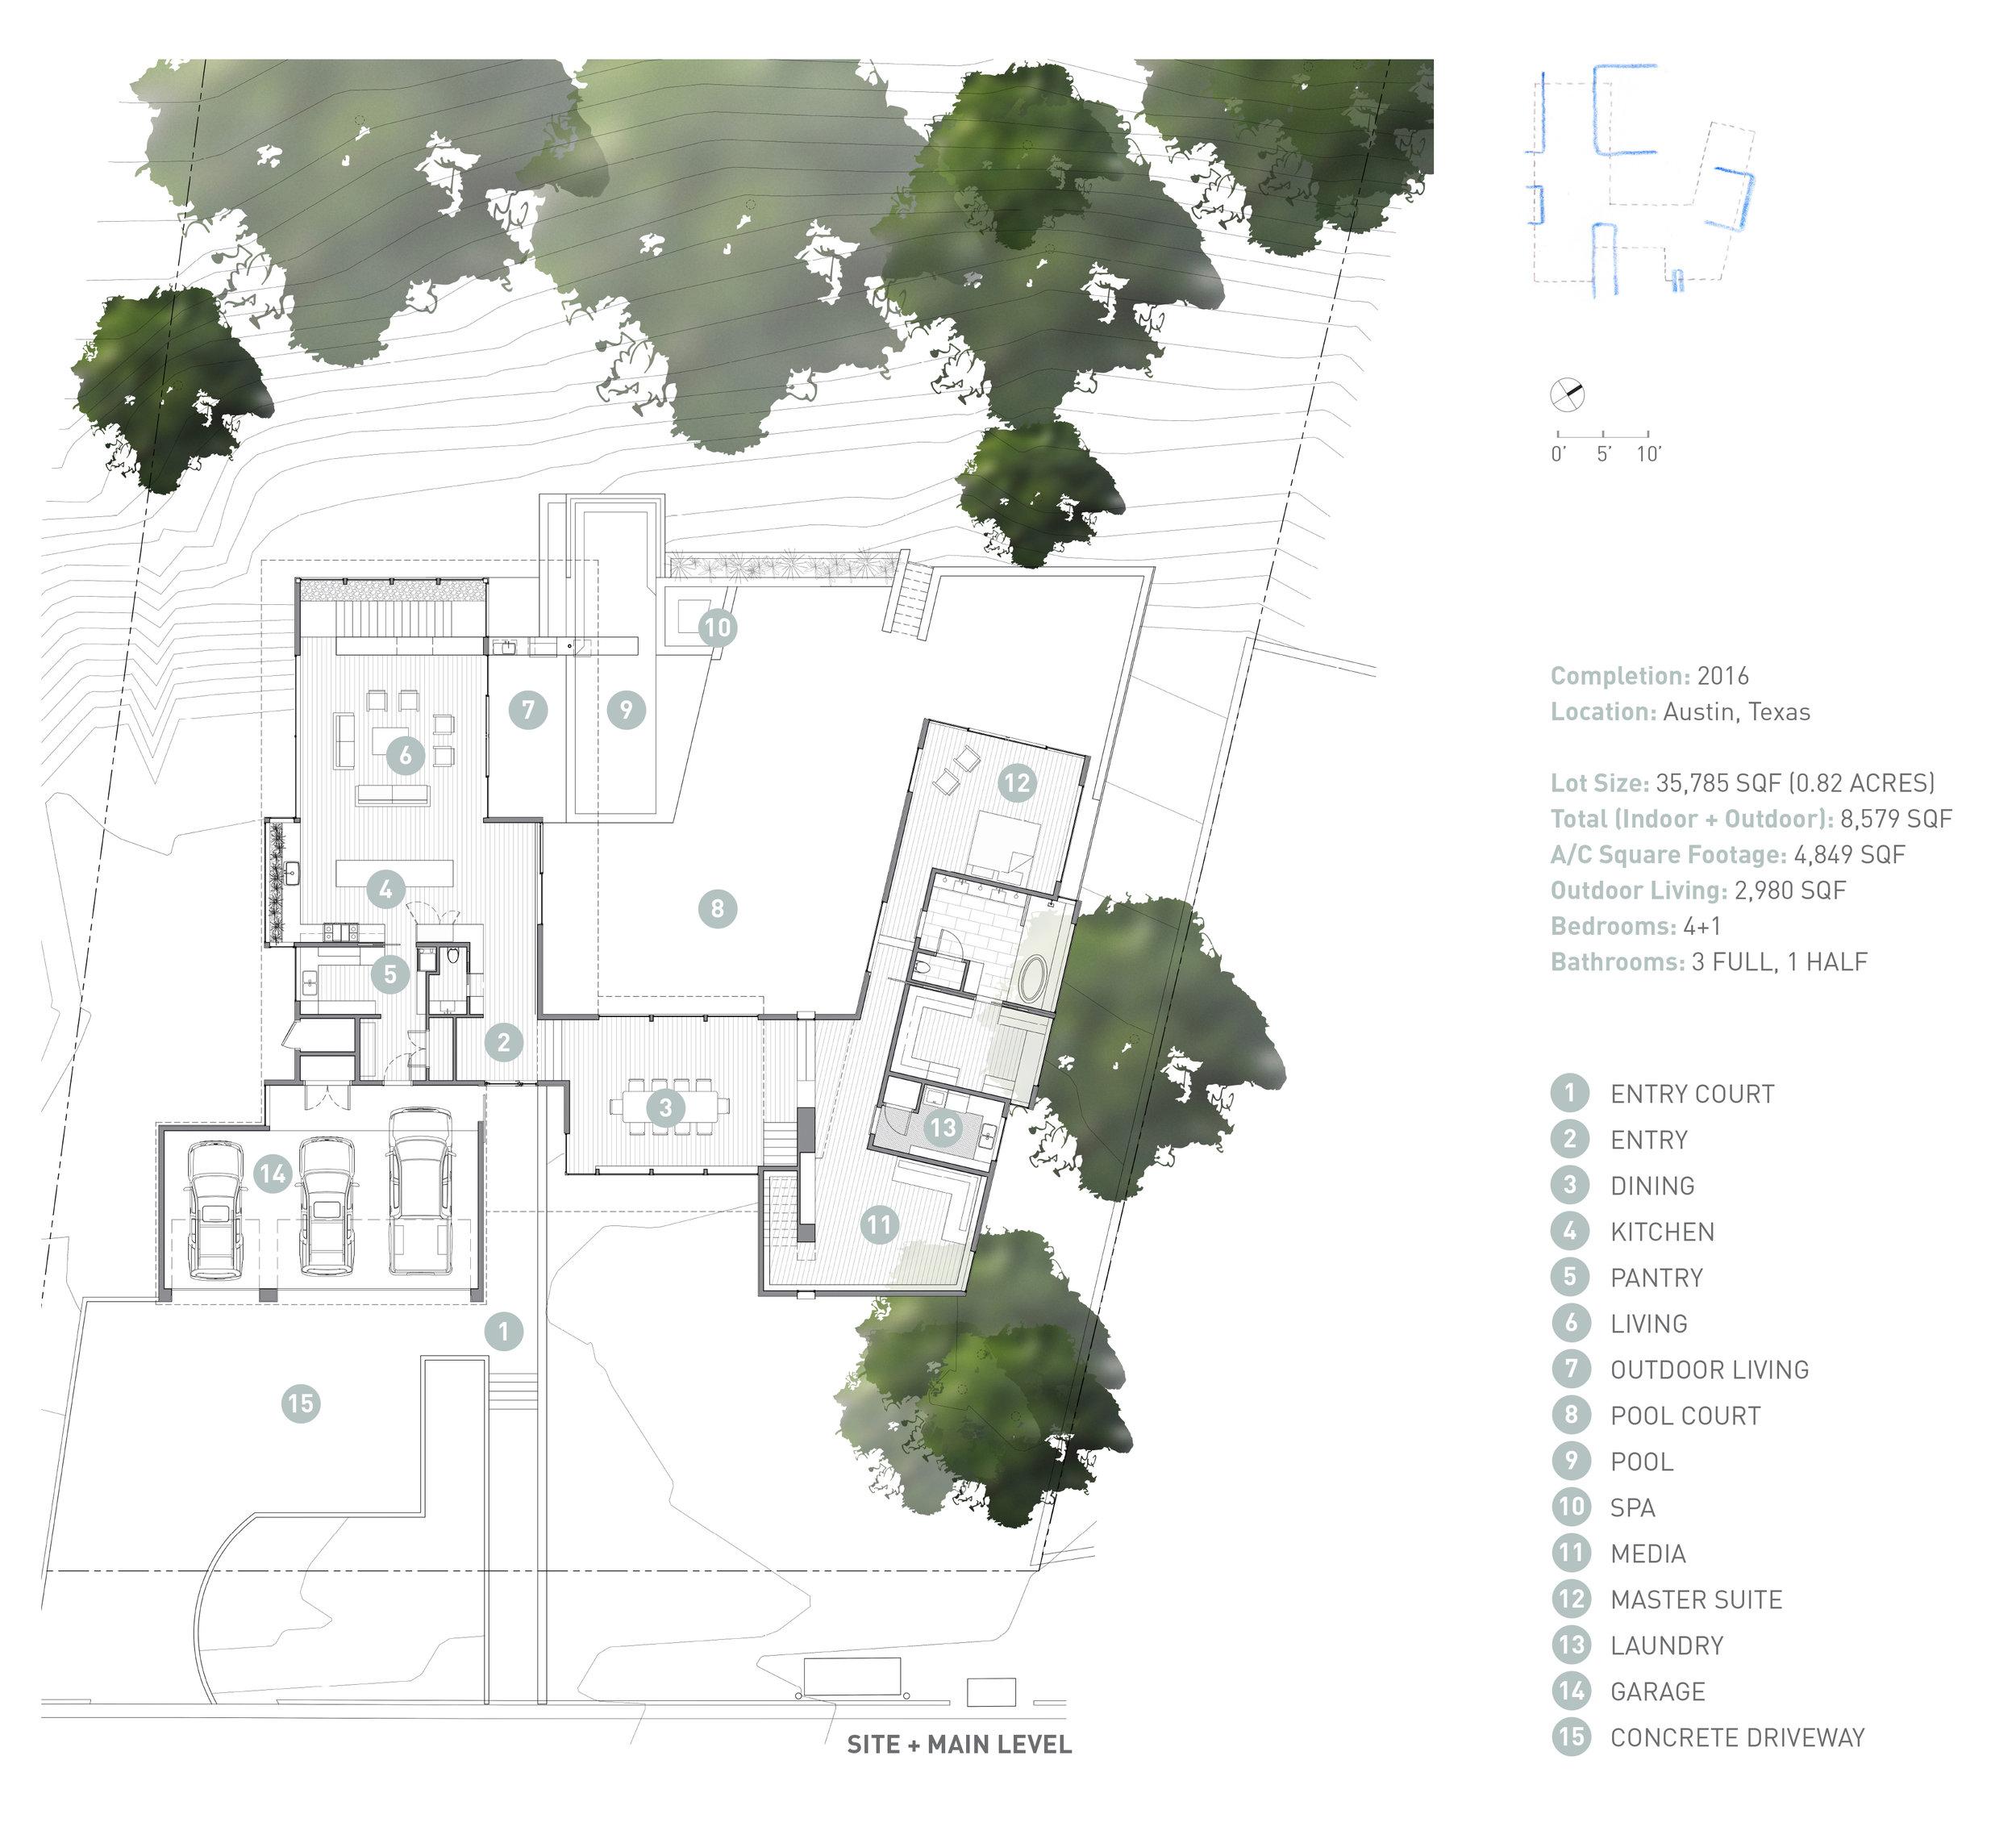 23 Matt Fajkus MF Architecture Bracketed Space House Sketch+Graphic Plan.jpg